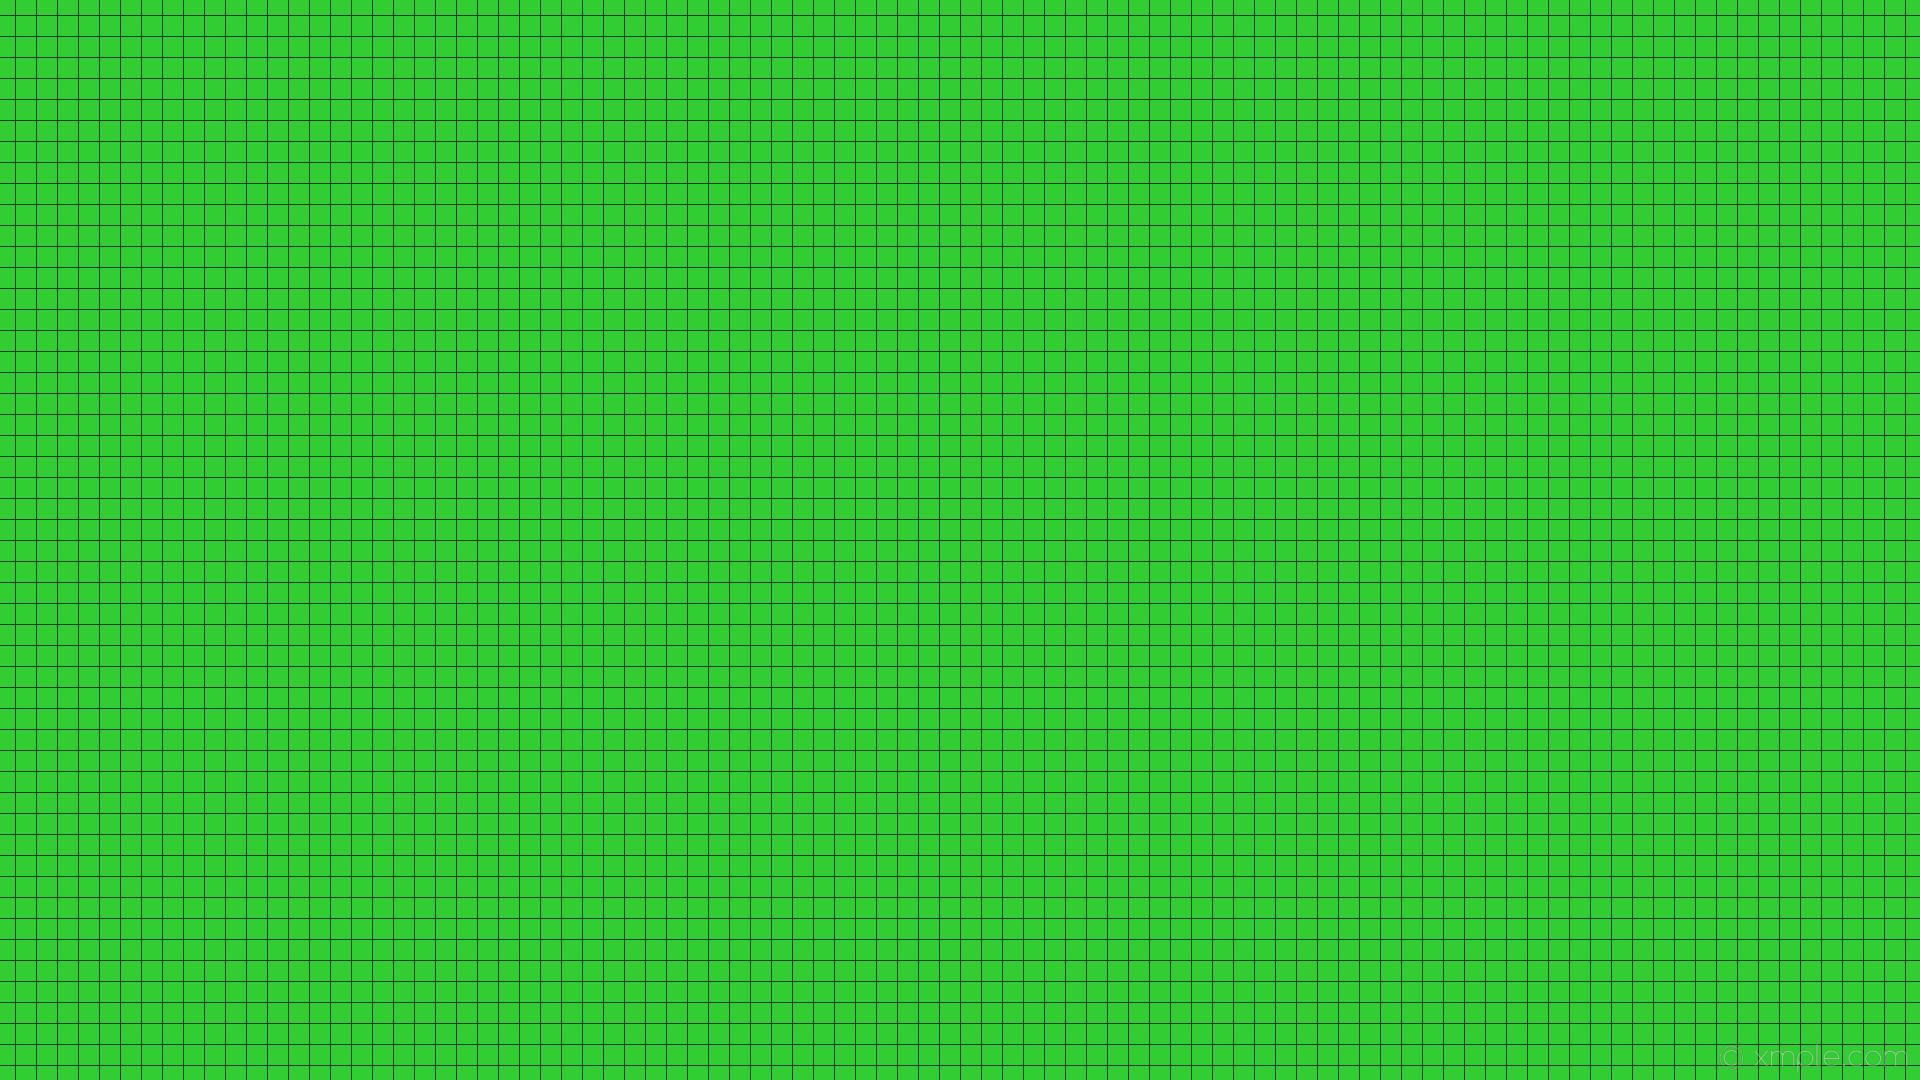 wallpaper green grid black graph paper lime green #32cd32 #000000 0° 1px  21px